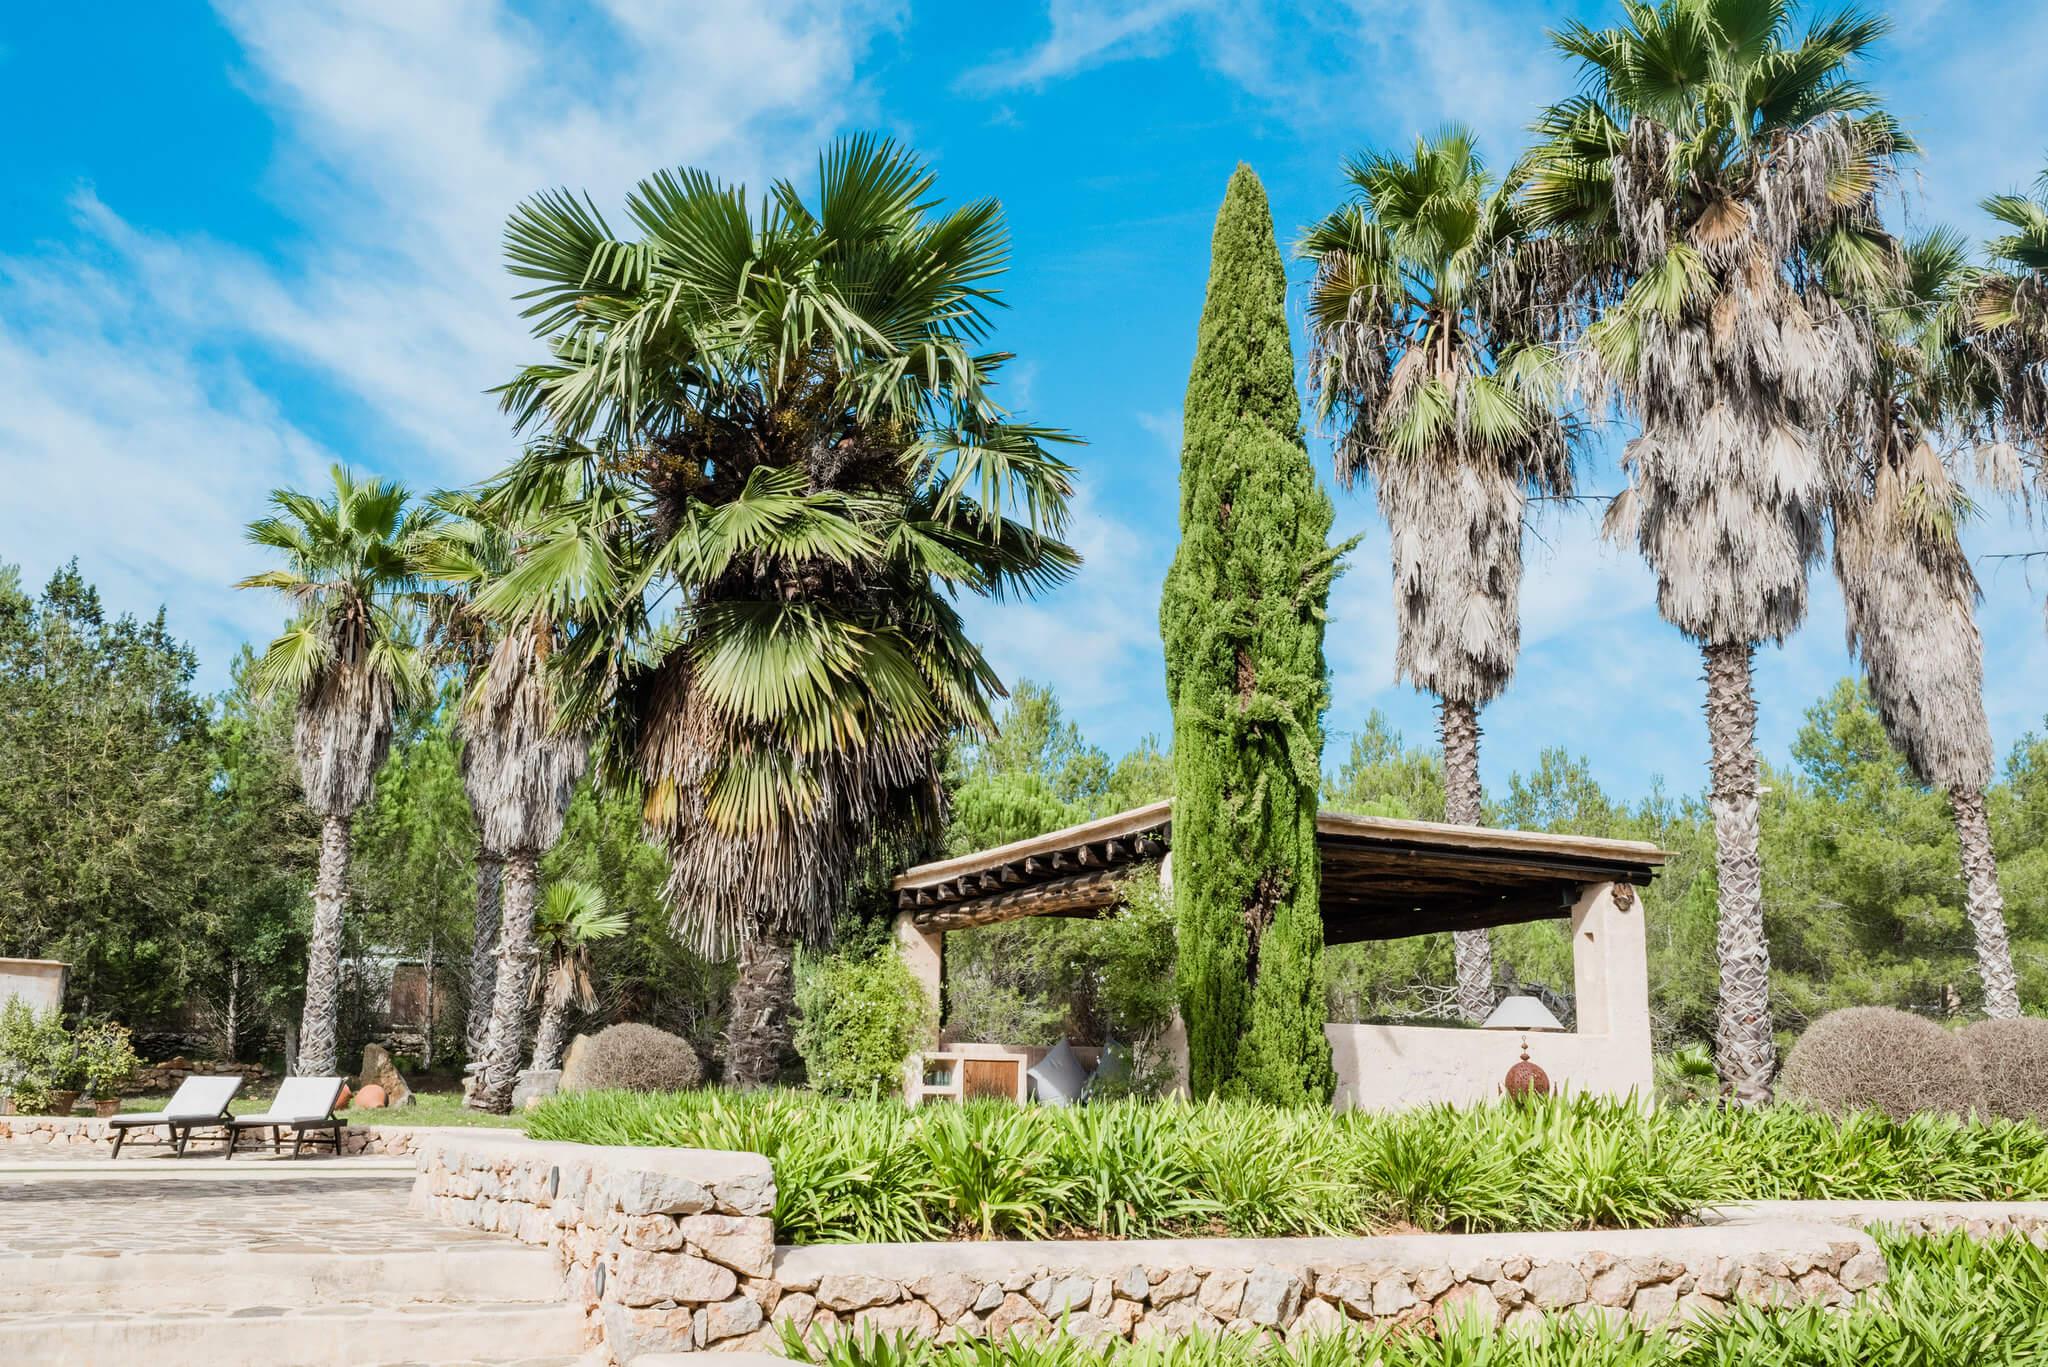 https://www.white-ibiza.com/wp-content/uploads/2020/05/white-ibiza-villas-can-sabina-exterior-trees.jpg